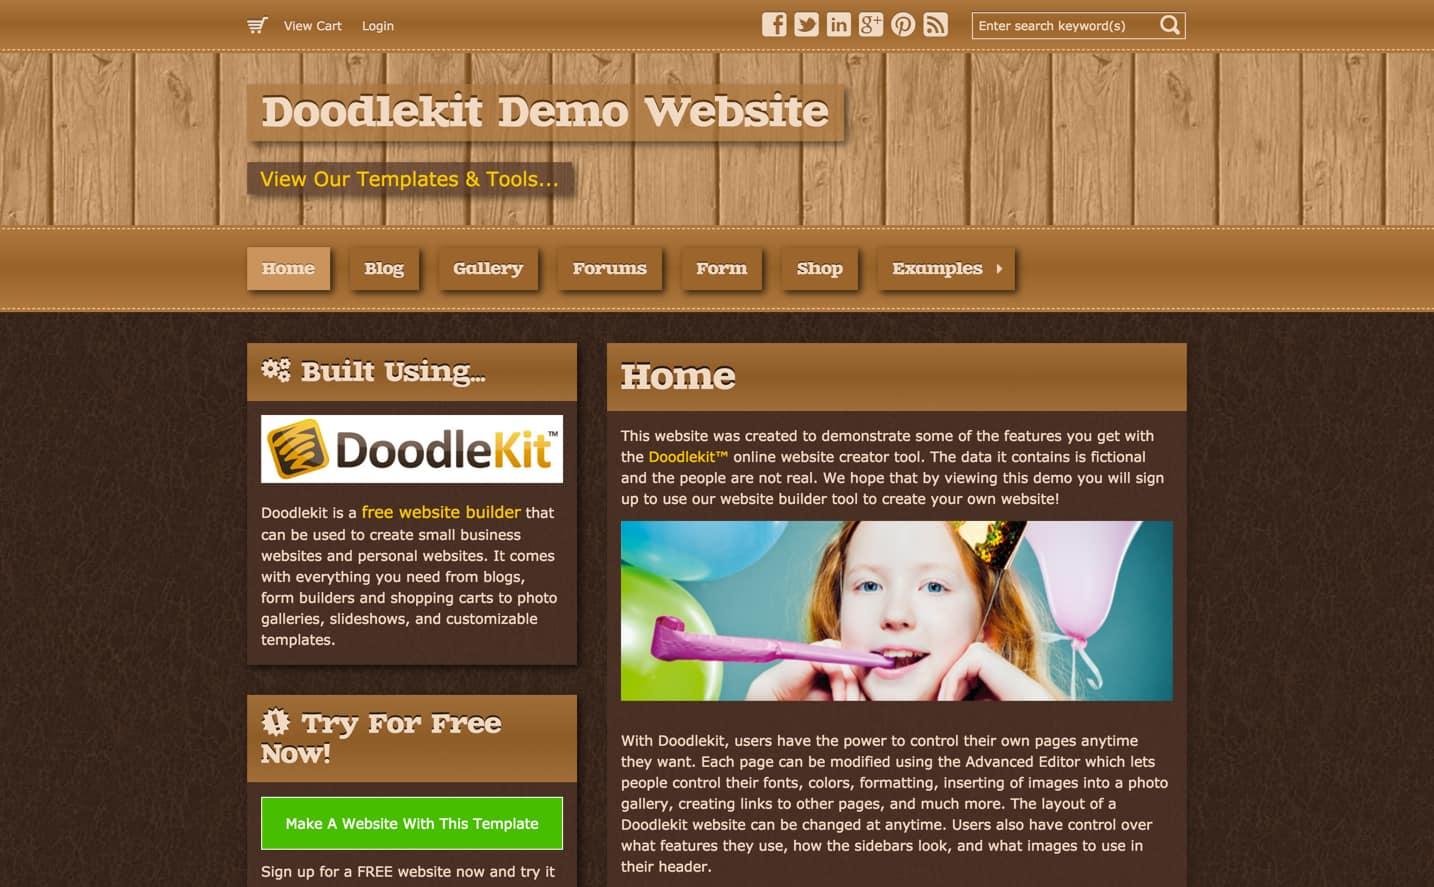 DoodleKit review